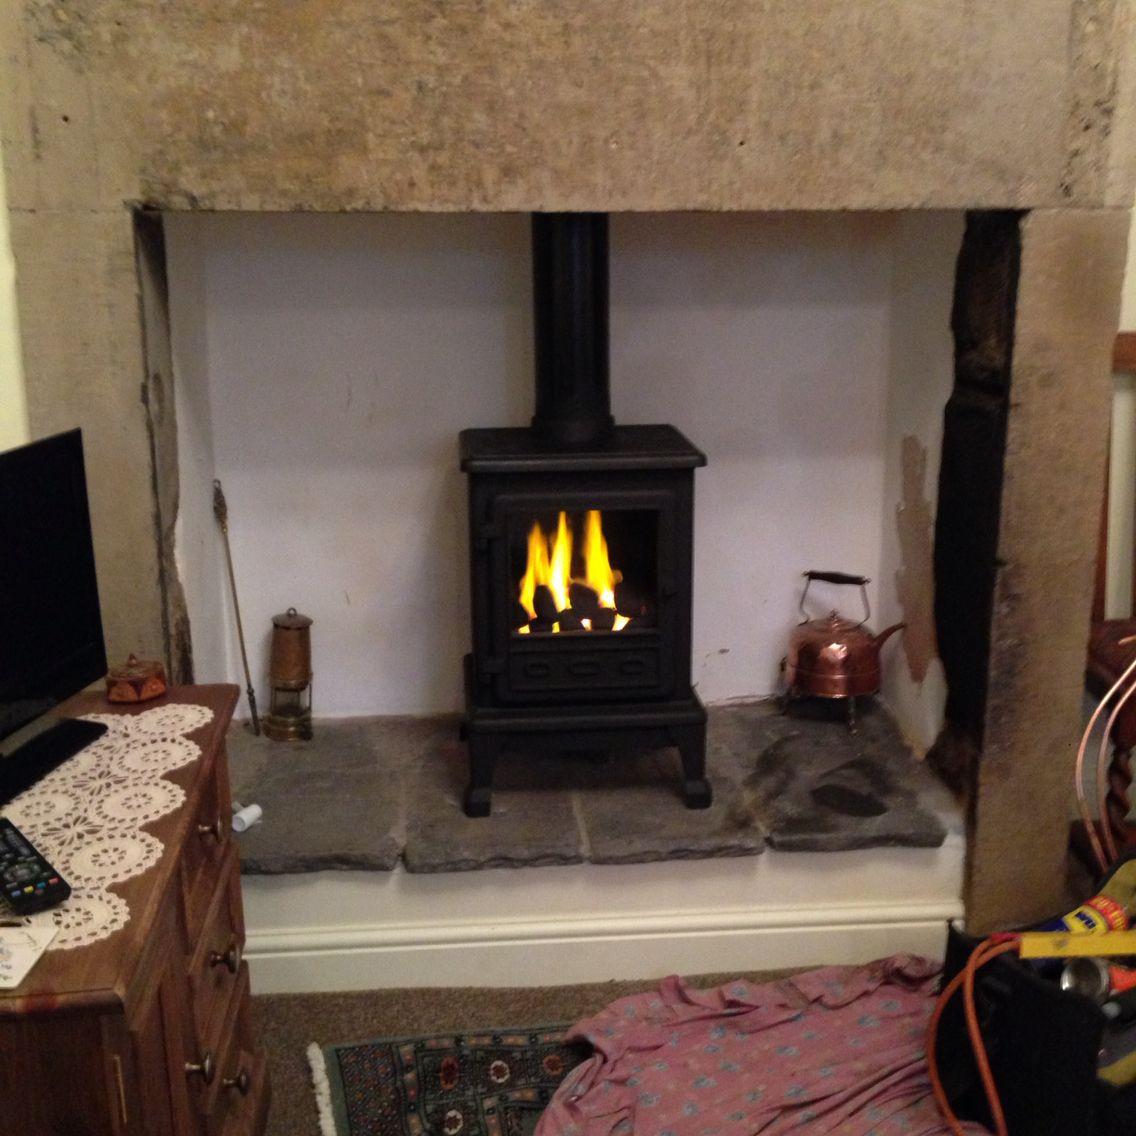 Fire fox 5 gas Gas stove, Home appliances, Stove